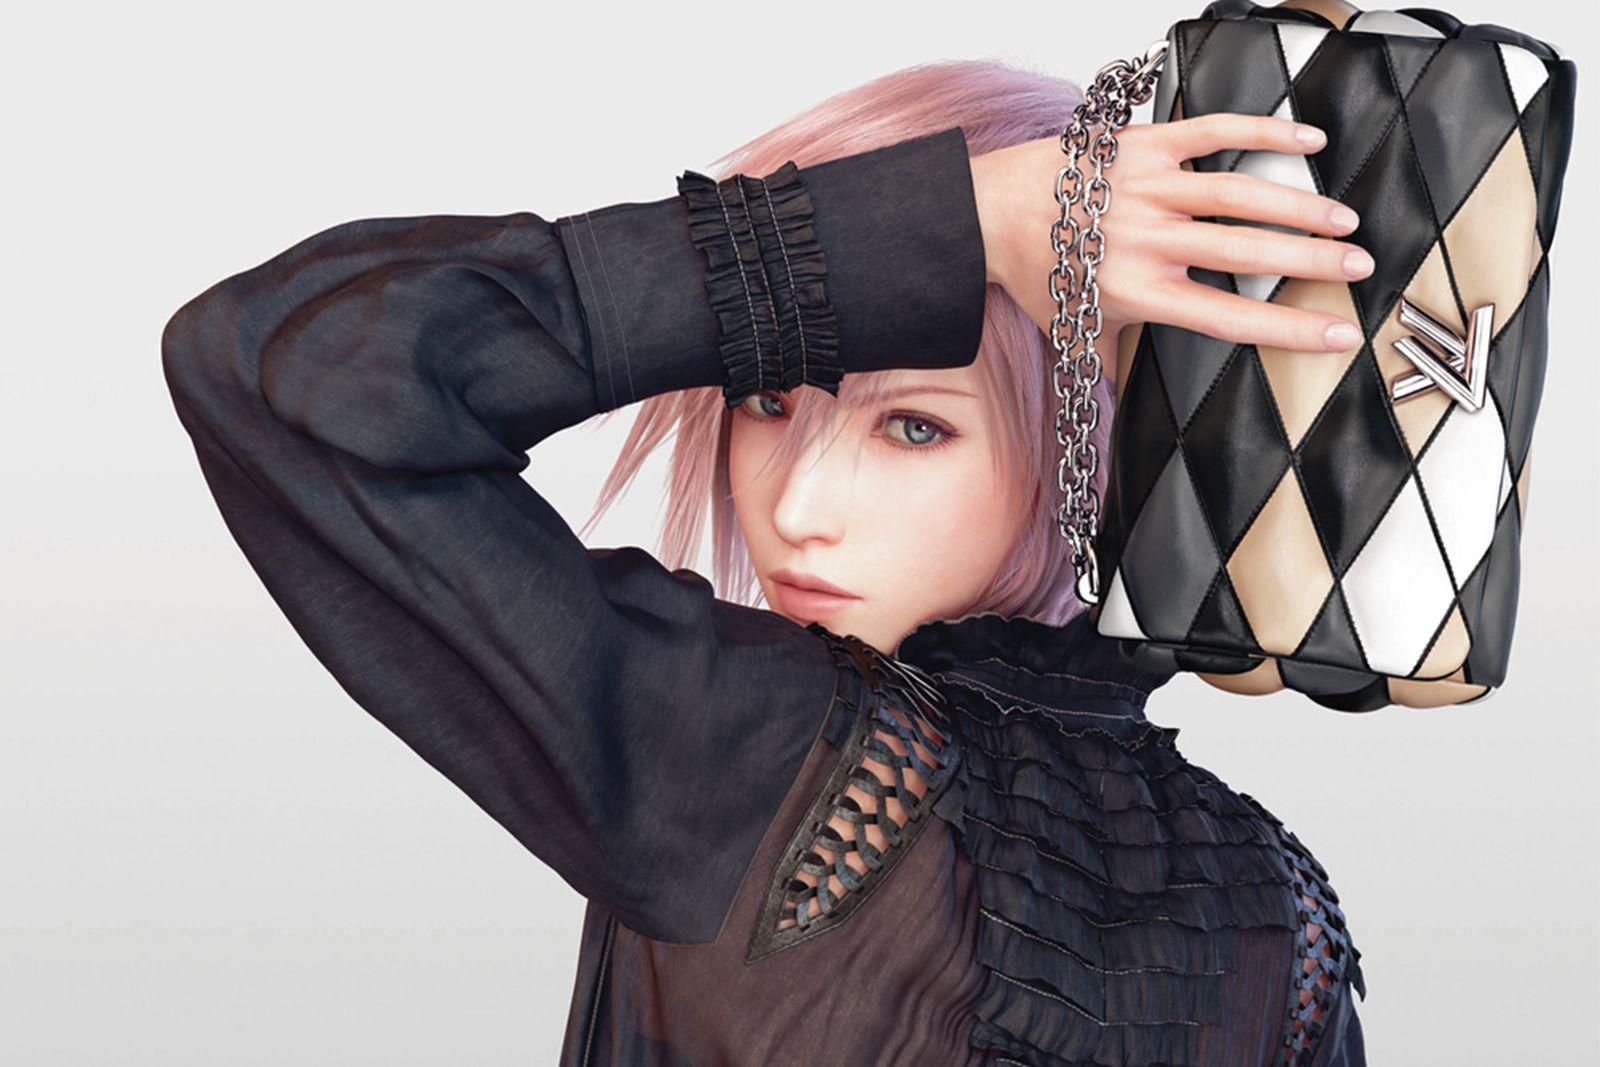 gaming-pushing-fashion-identity-crisis-01